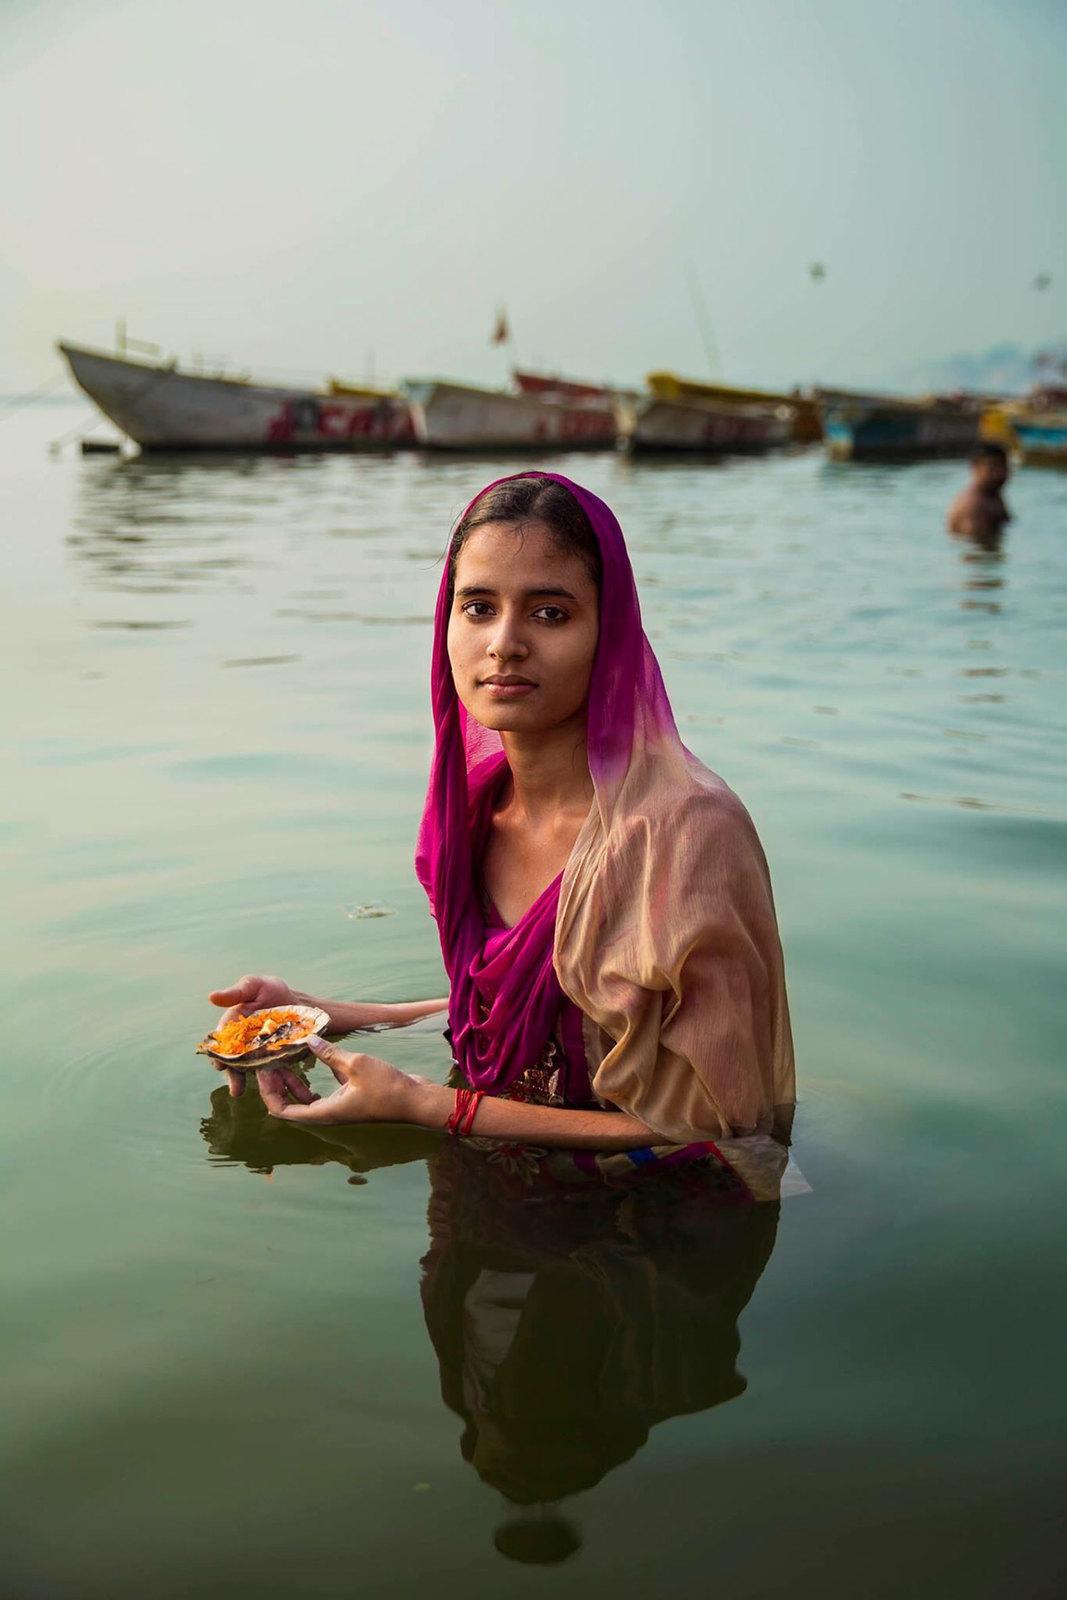 Portrait de femme, Gange Varanasi India Photo: Mihaela Noroc